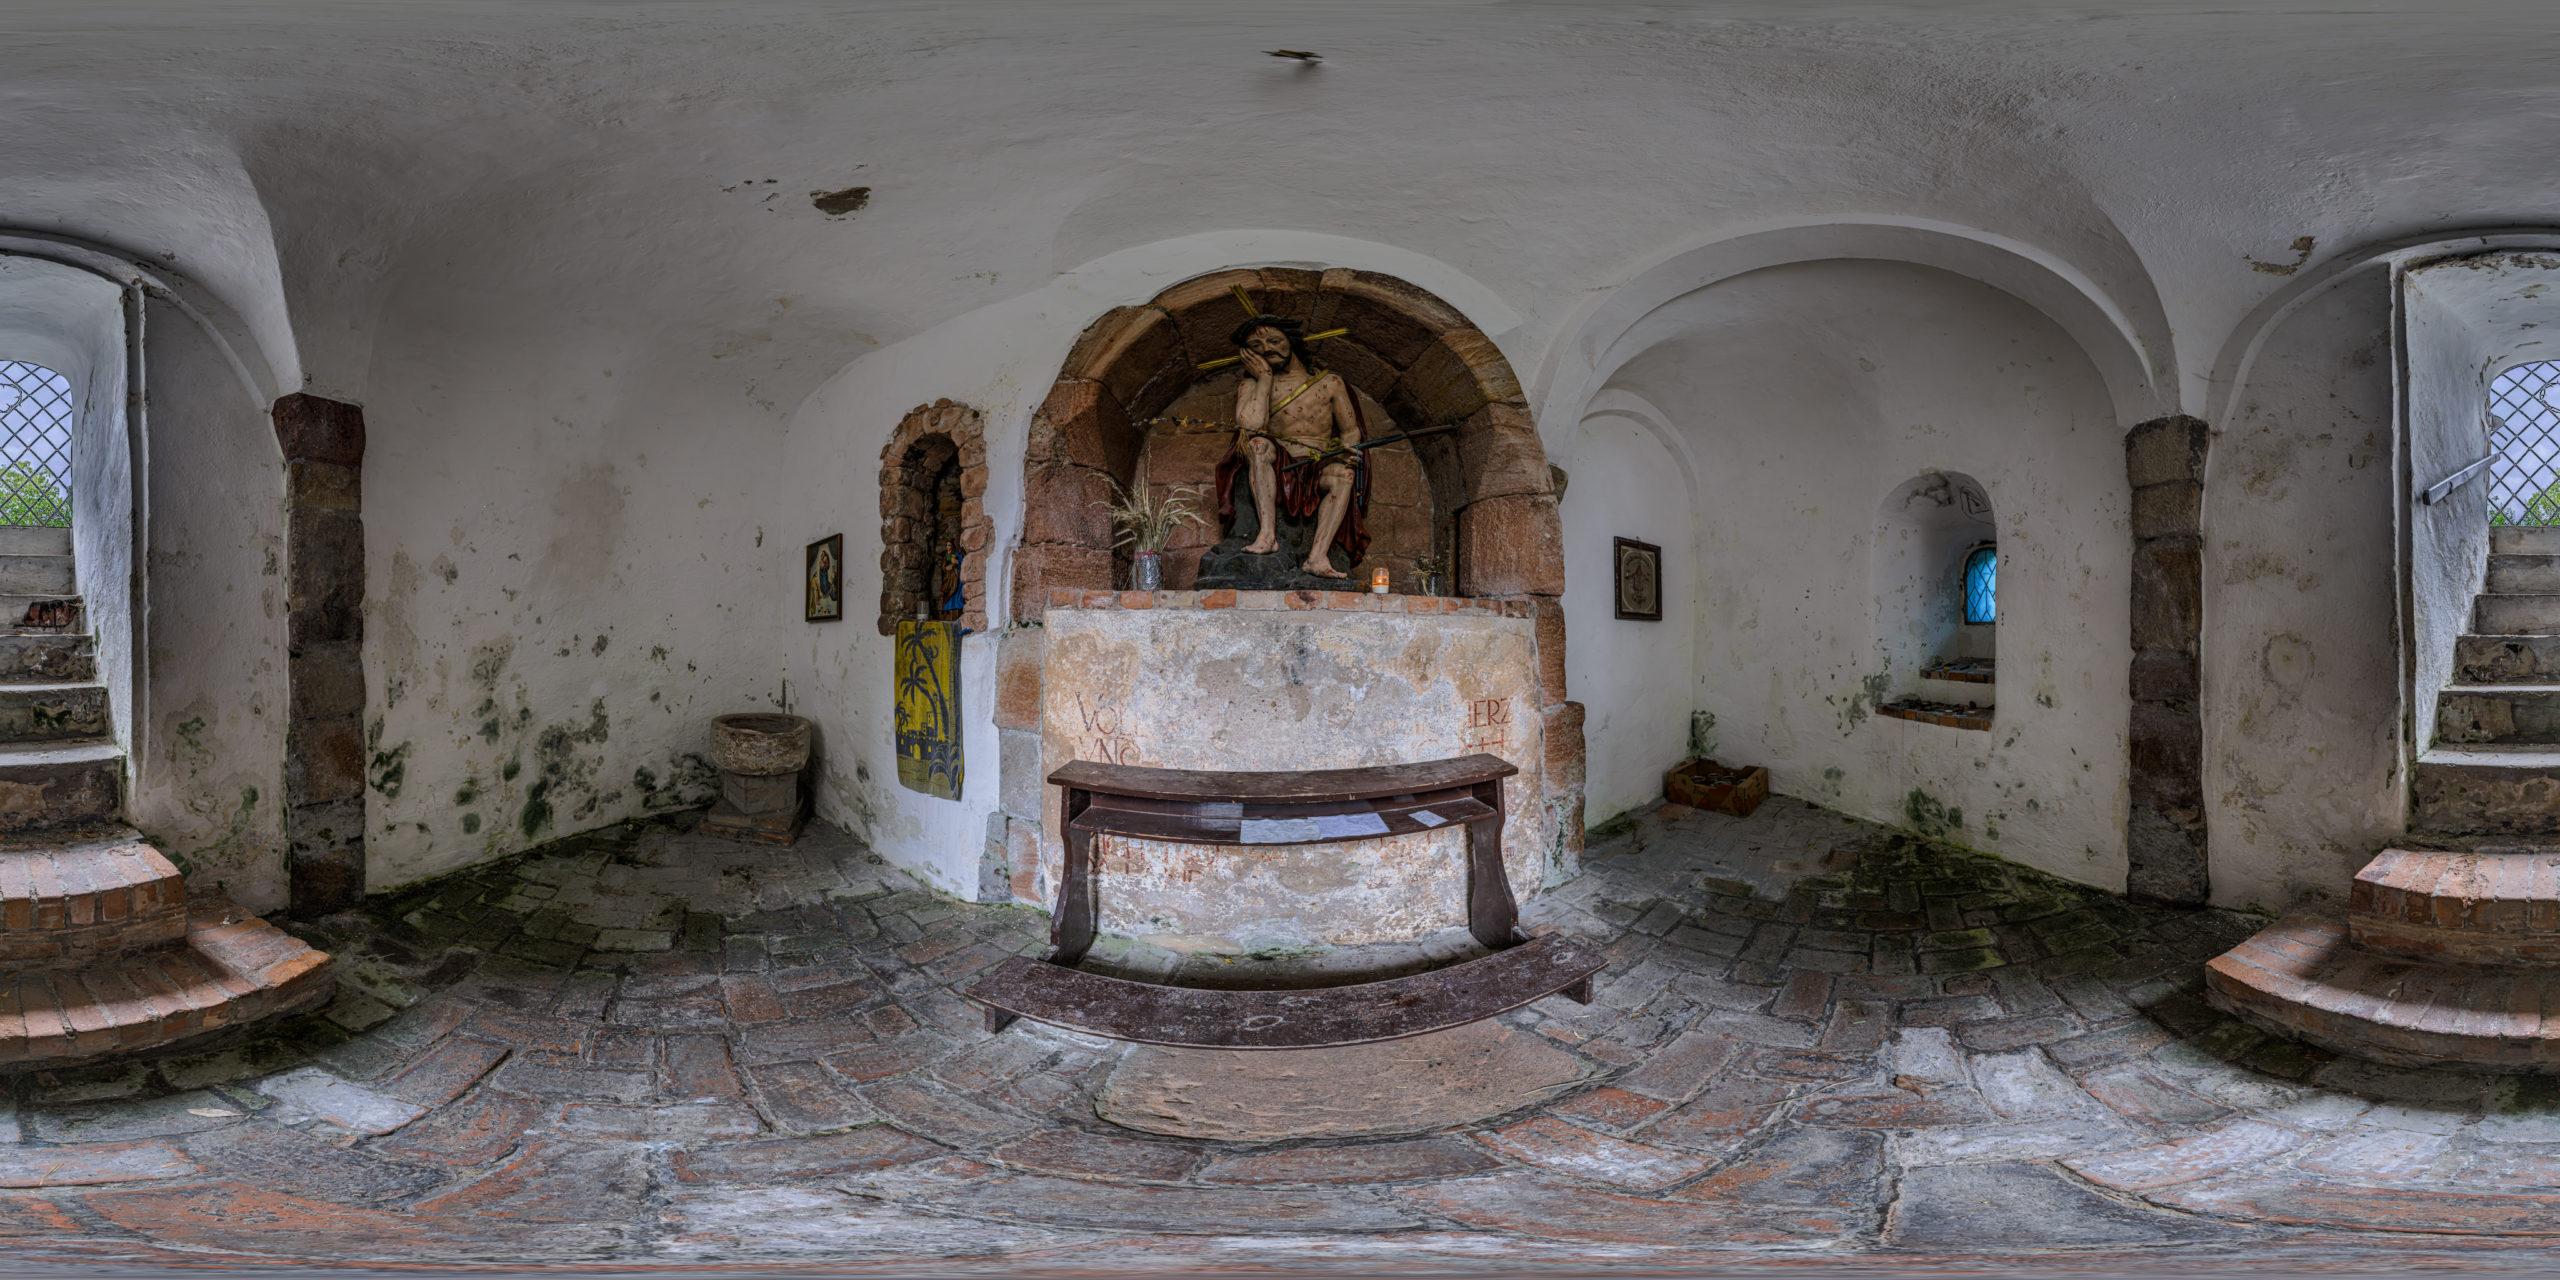 HDRI-Skies-Saint-Emmeram-Crypt-Spalt